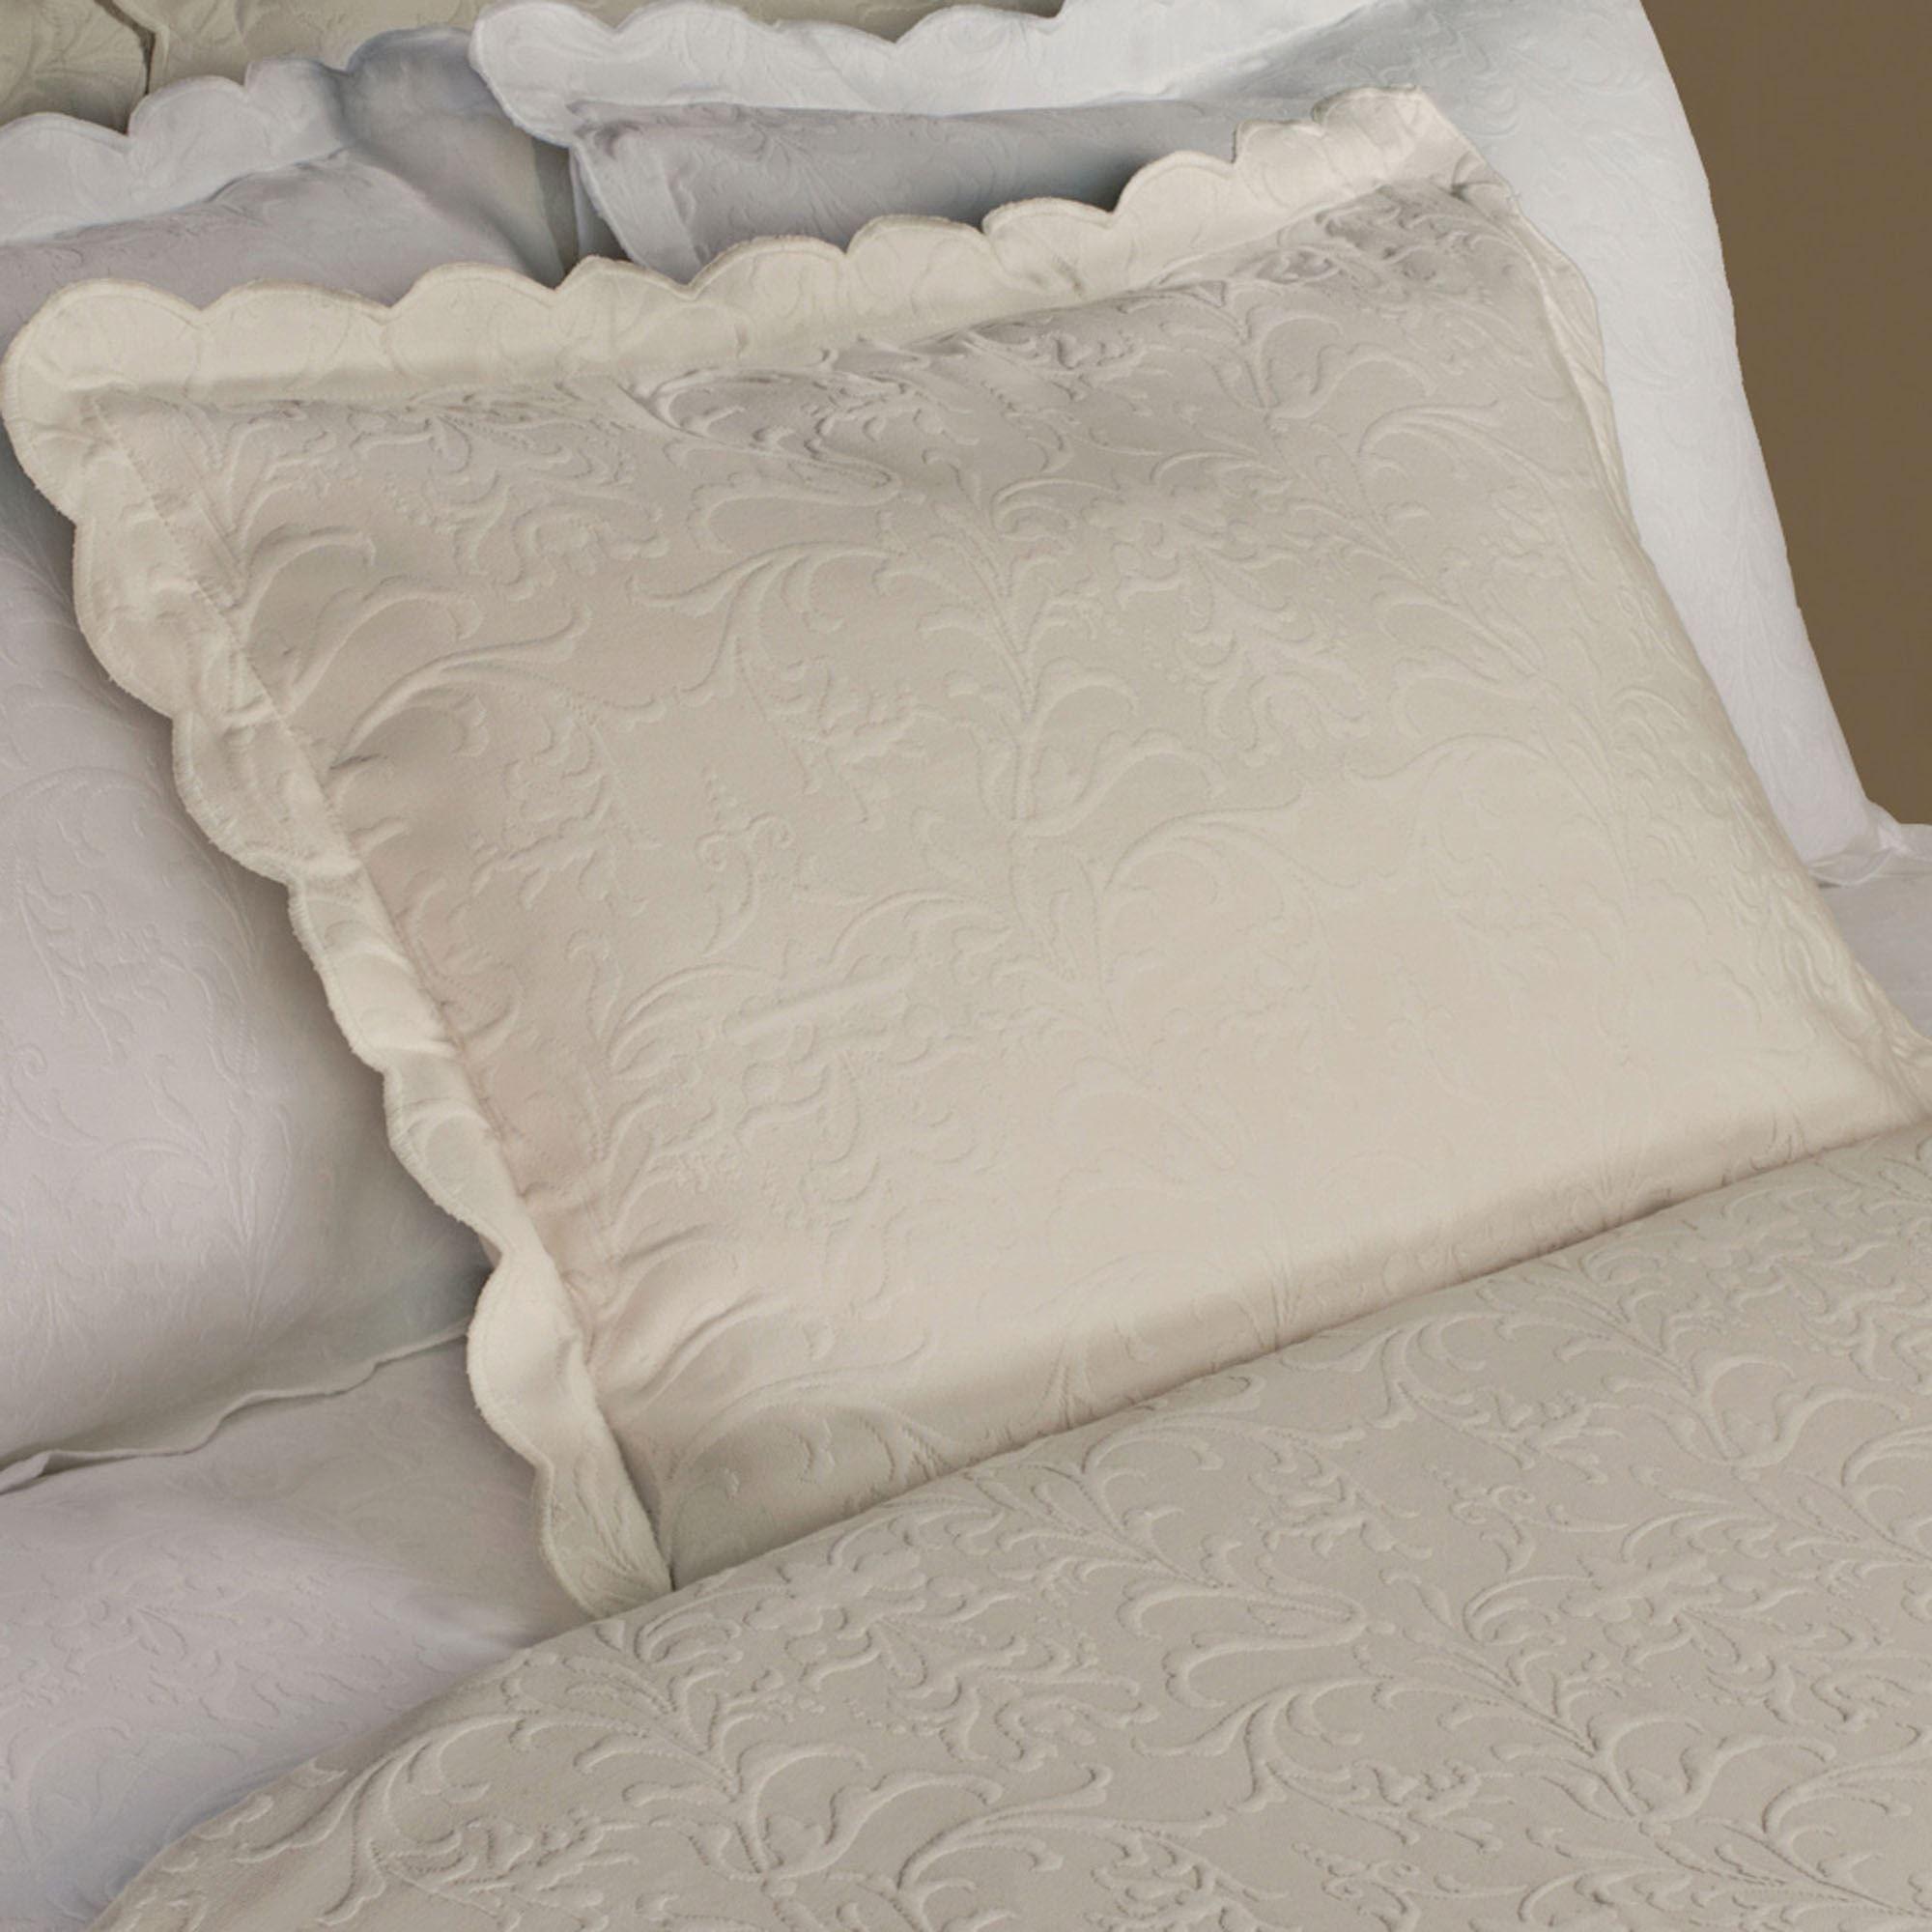 Majestic Scalloped Brocade Matelasse Sham Coverlet Bedding Bed Coverlets